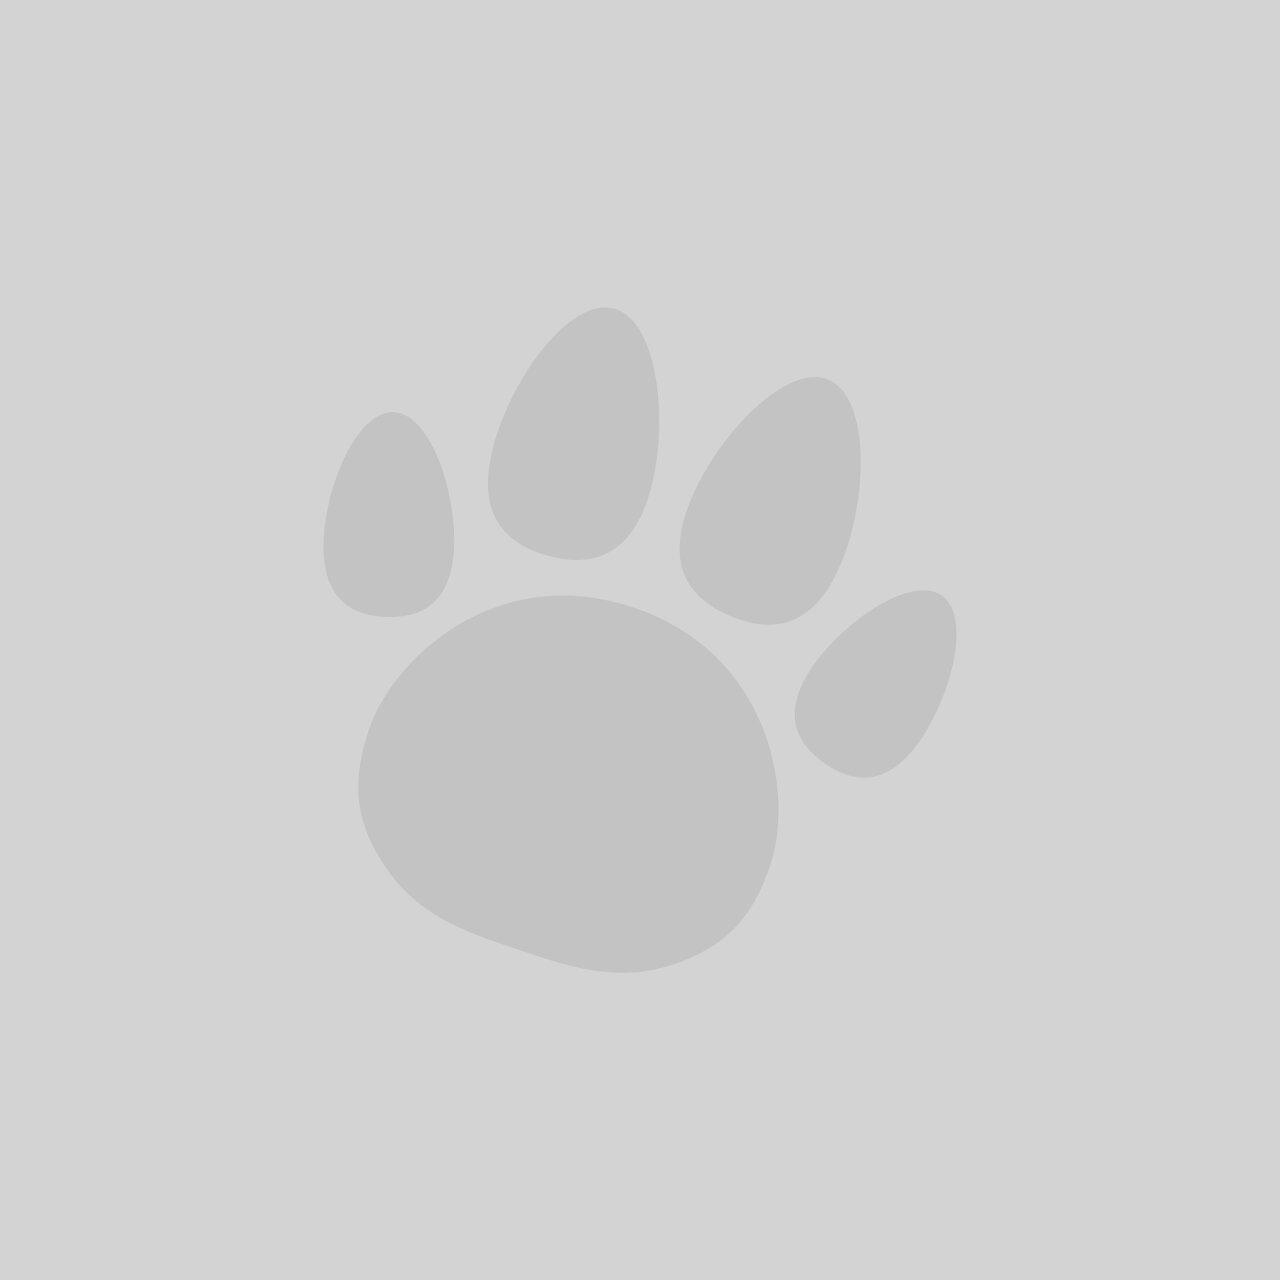 Felix Kitten Mixed in Jelly Pouch Multipack 12x100g